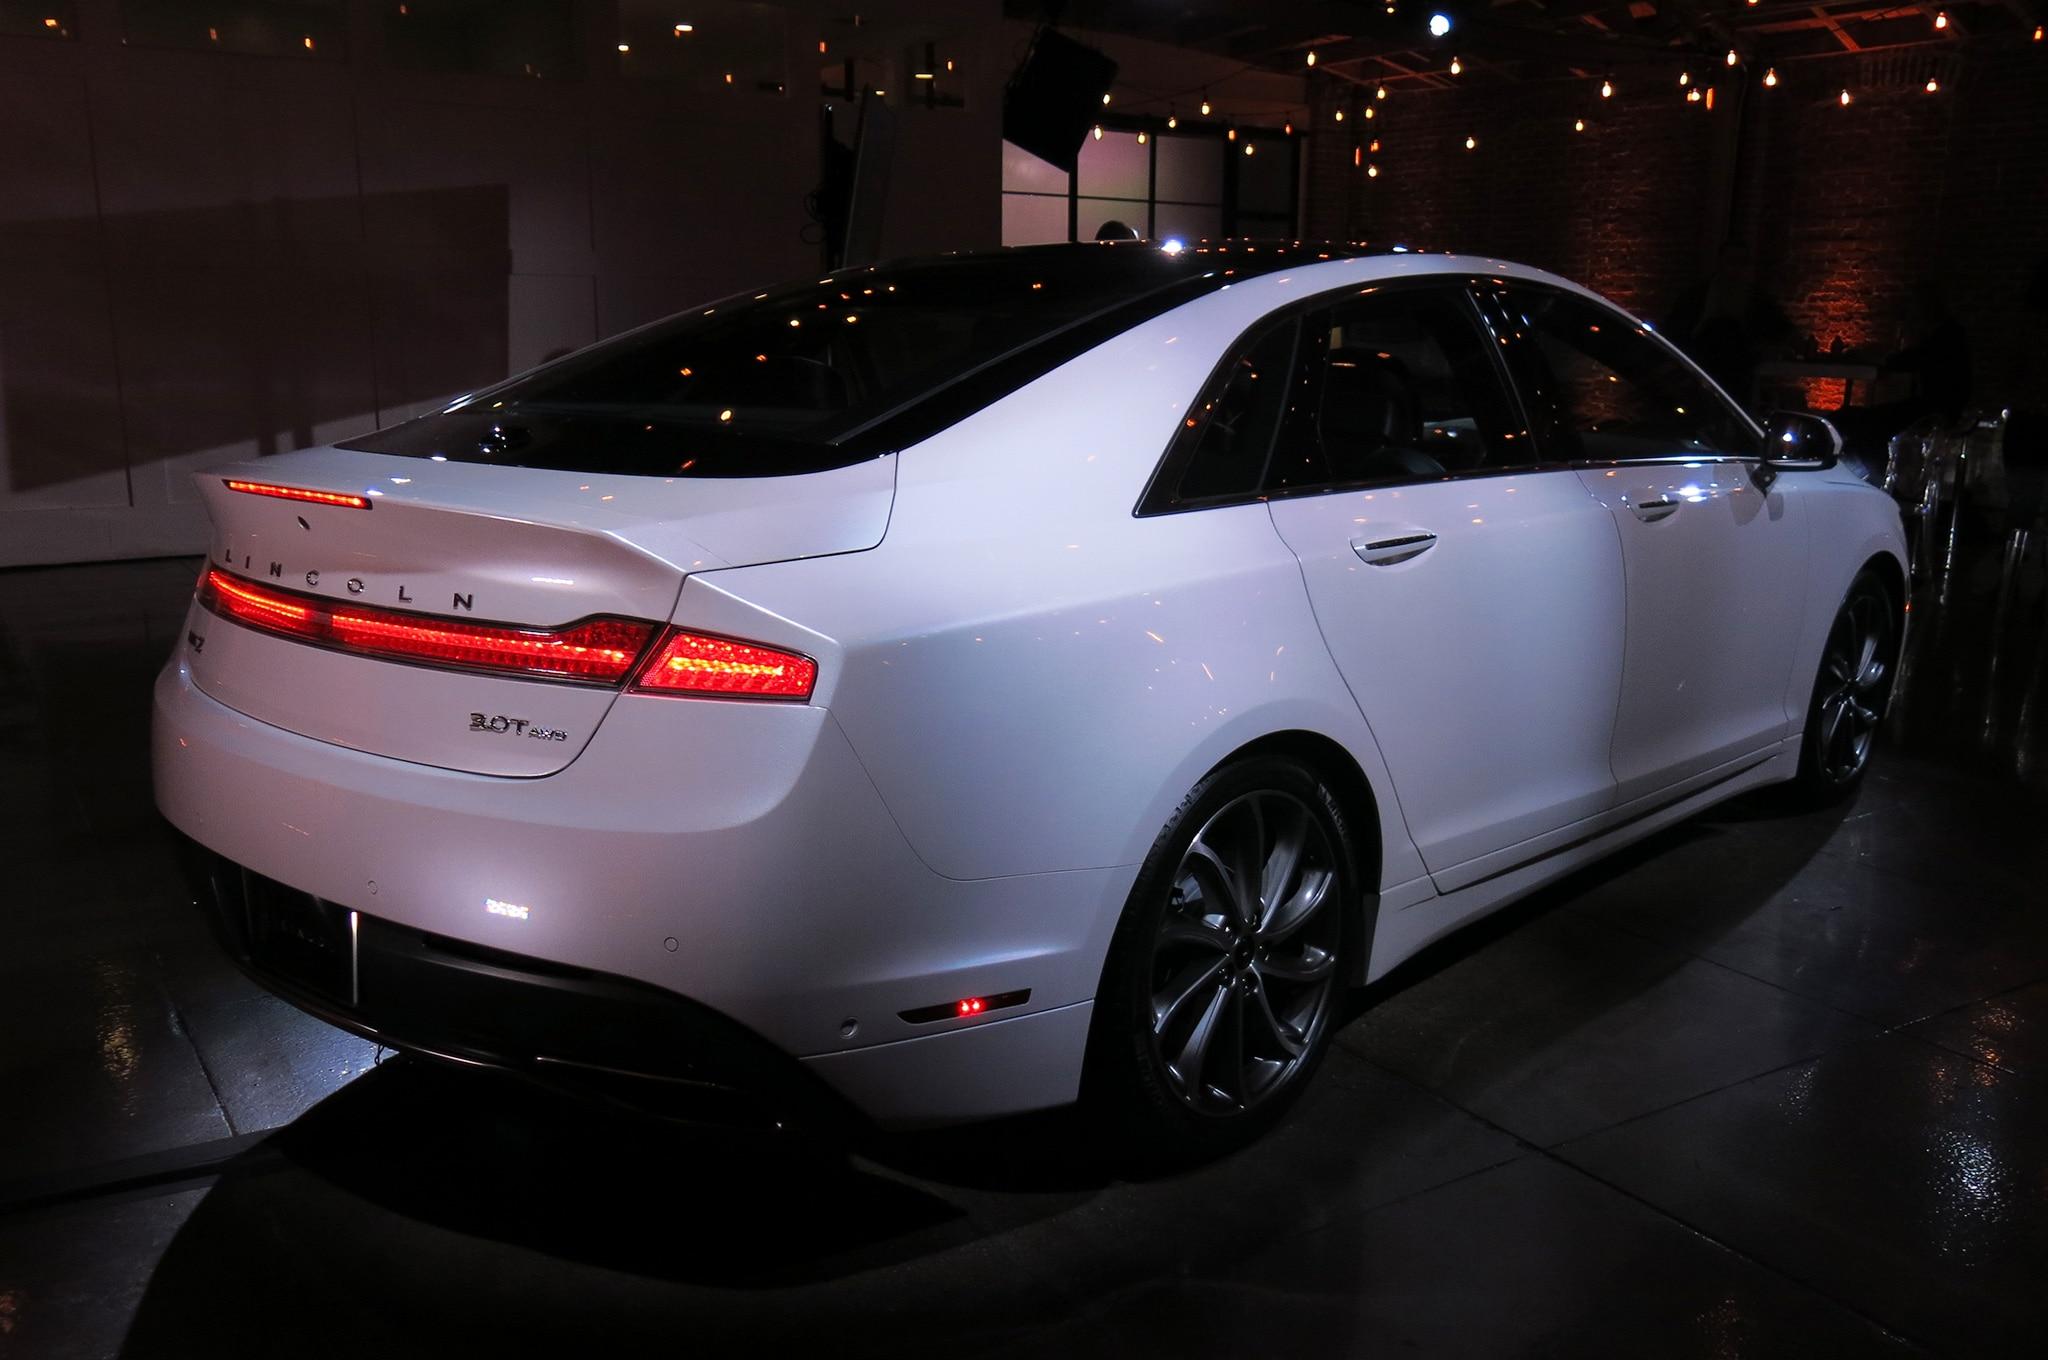 http://st.automobilemag.com/uploads/sites/11/2015/11/2017-lincoln-mkz-reveal-rear-three-quarters-02.jpg